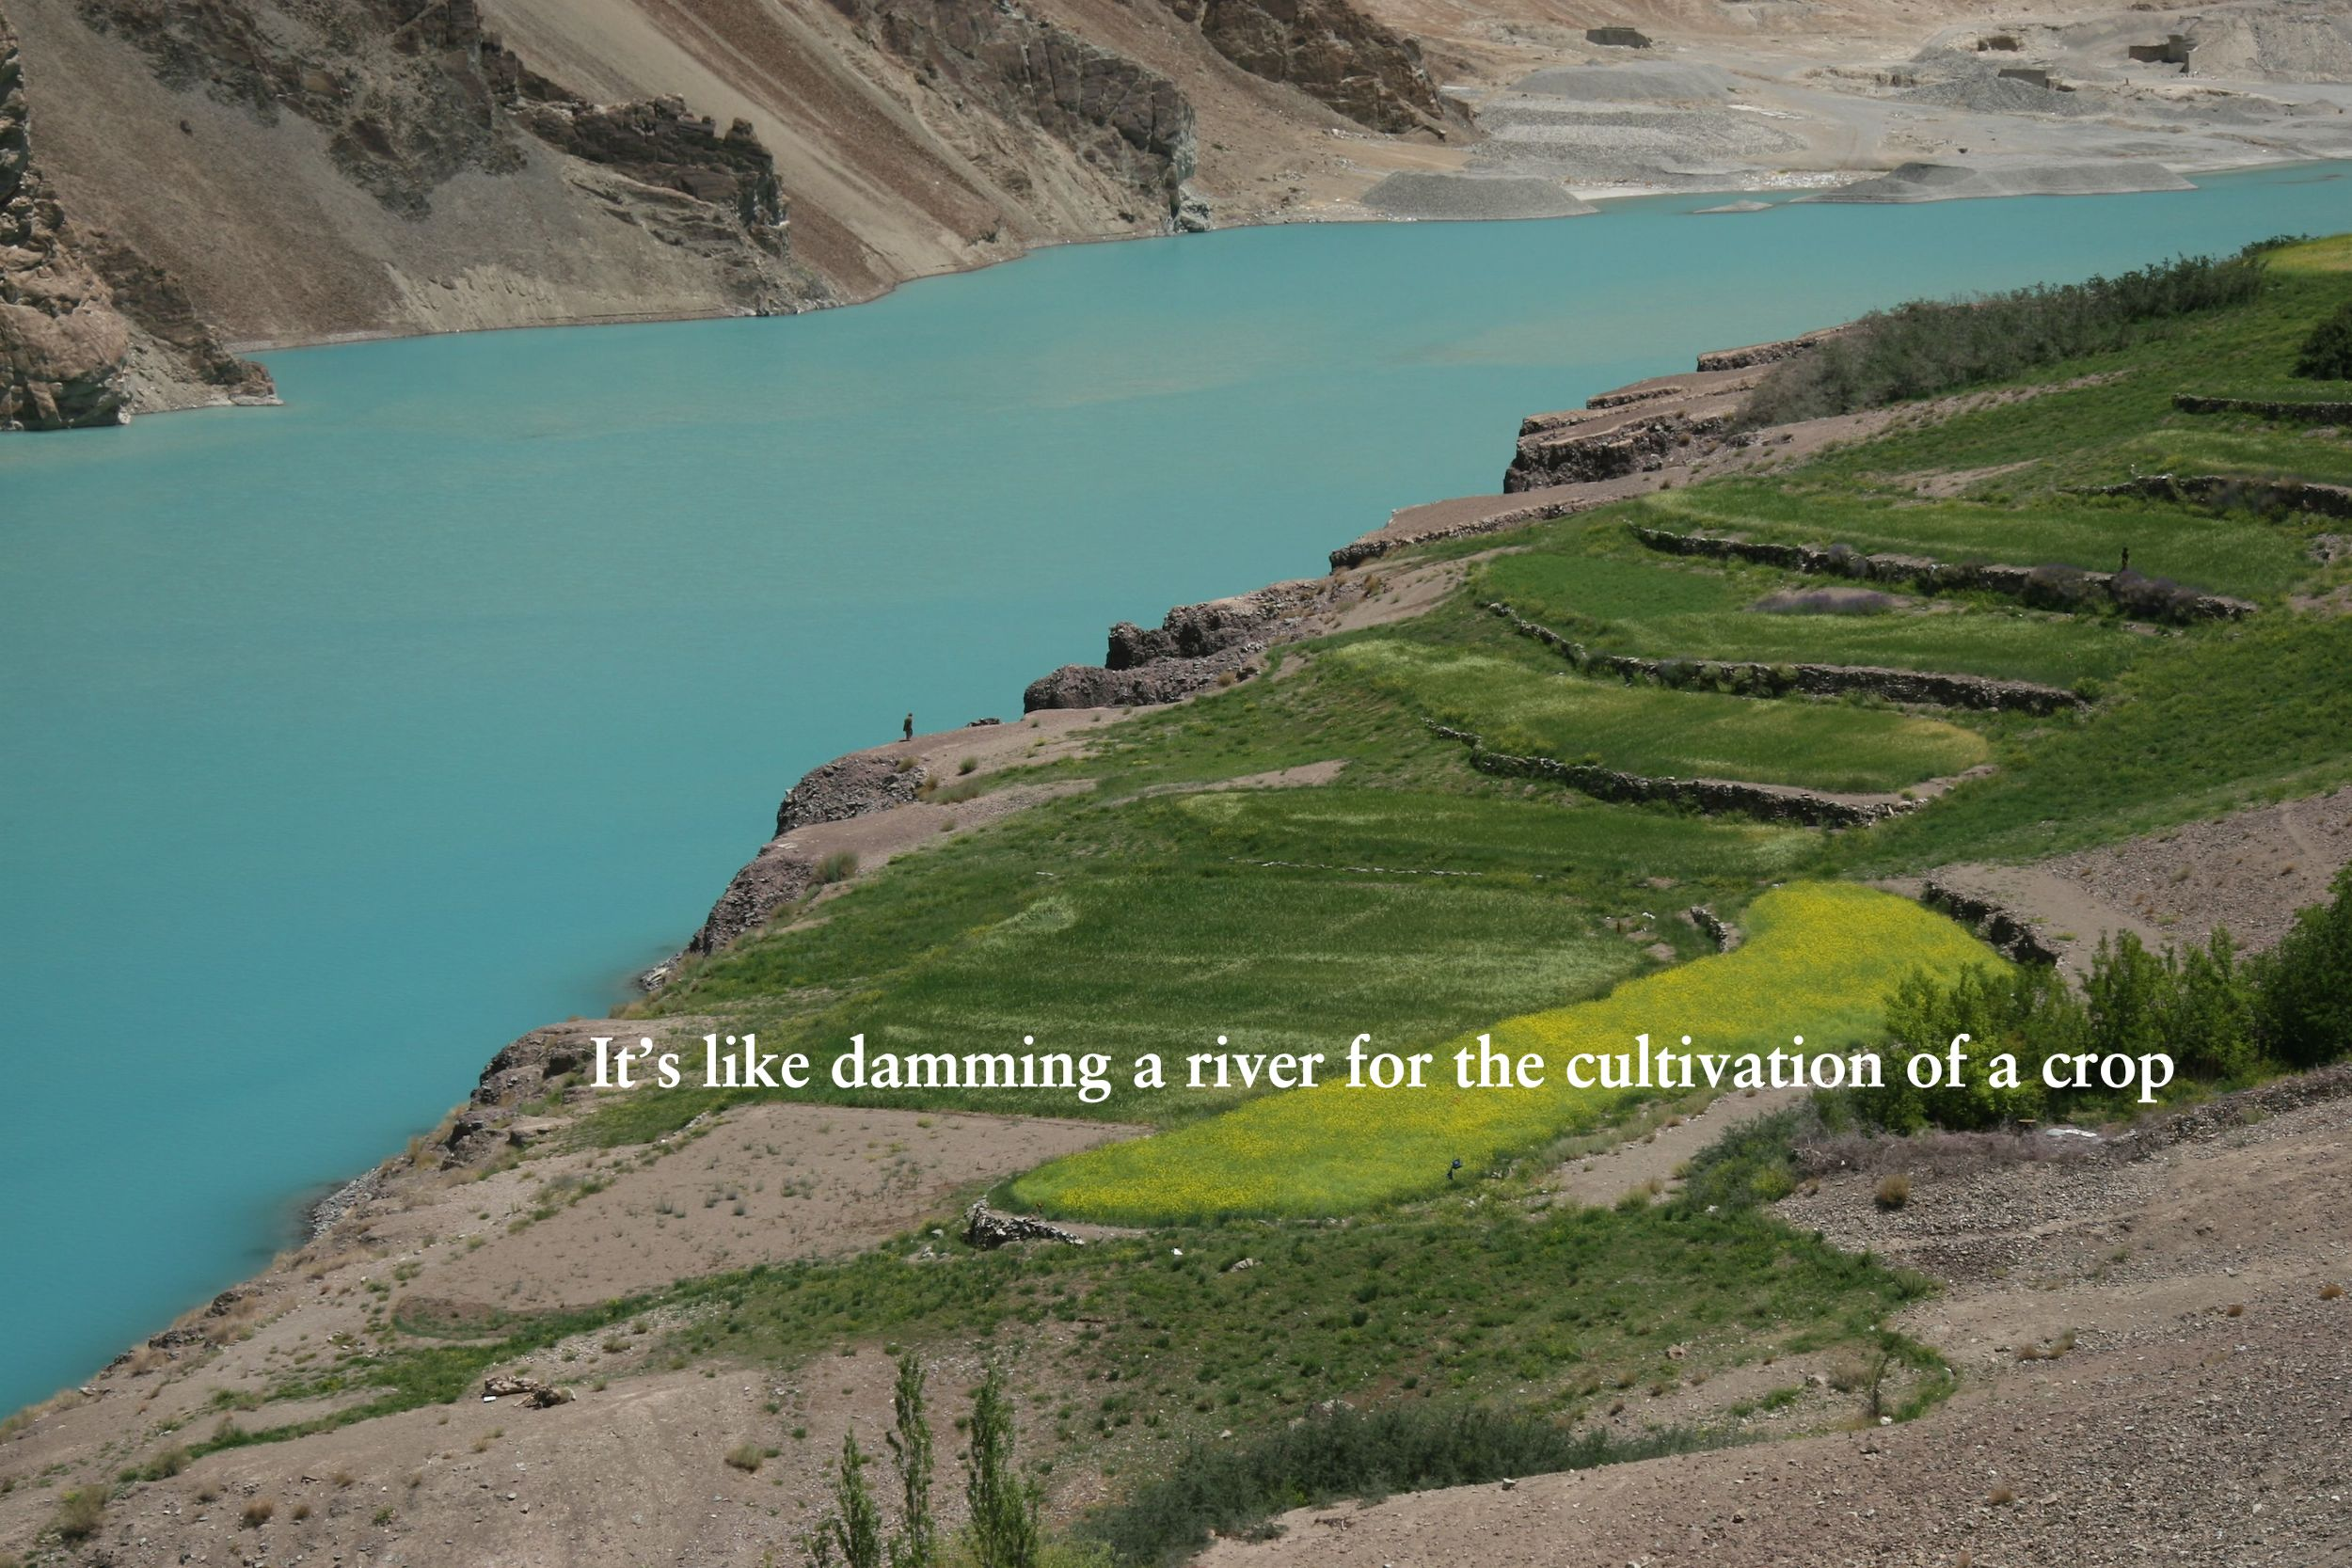 It's like damming a river.jpg